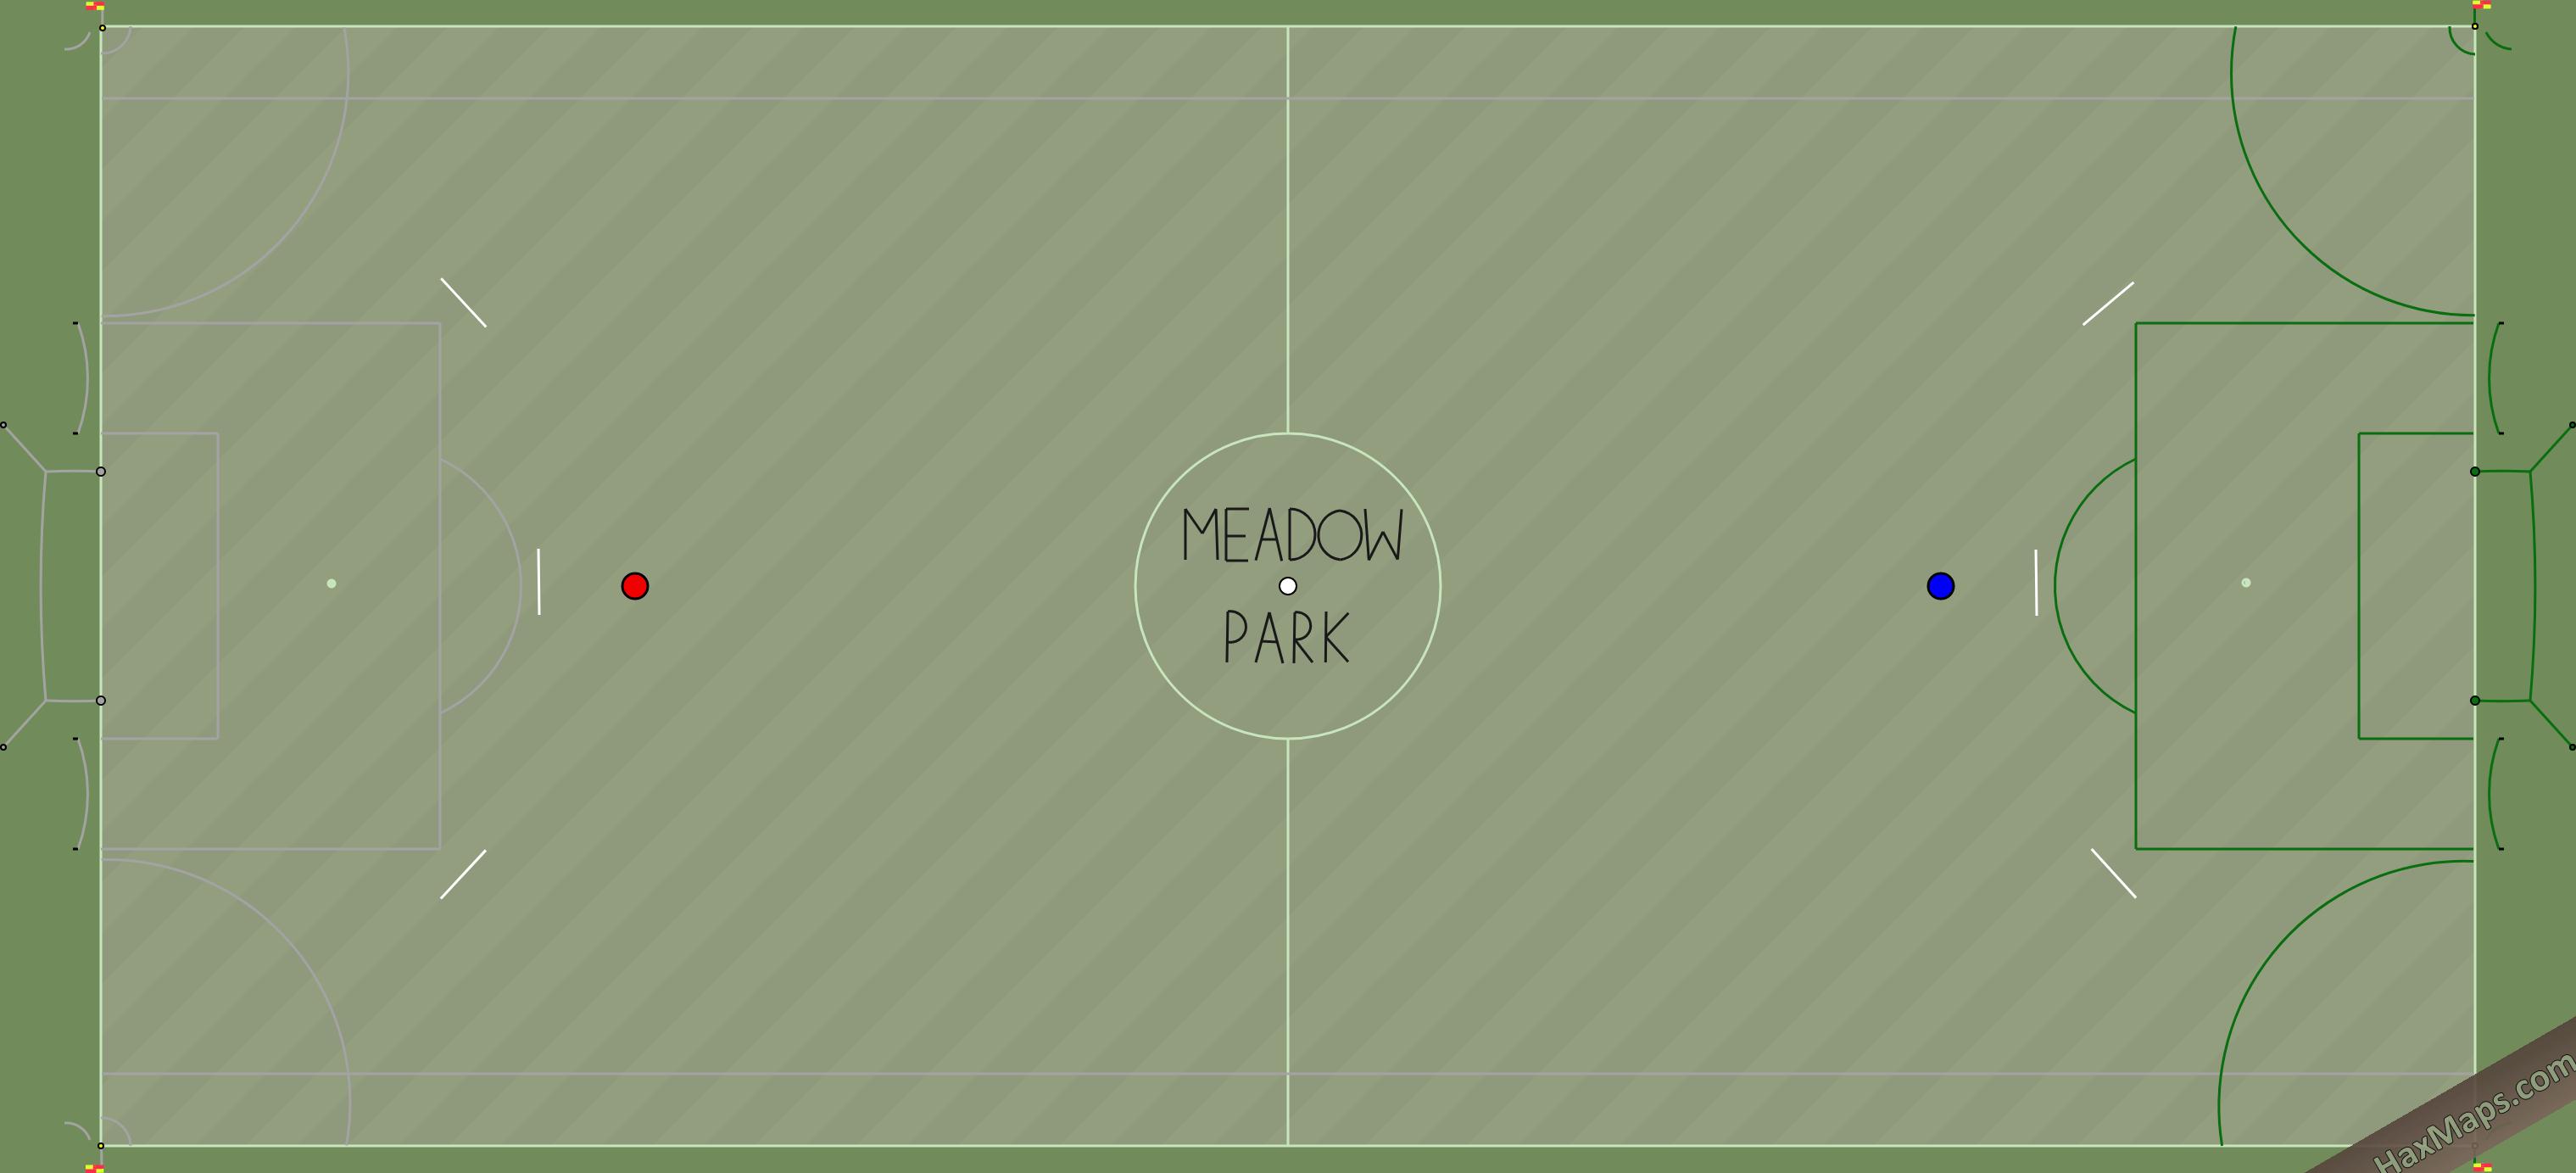 hax ball maps | MEADOW PARK